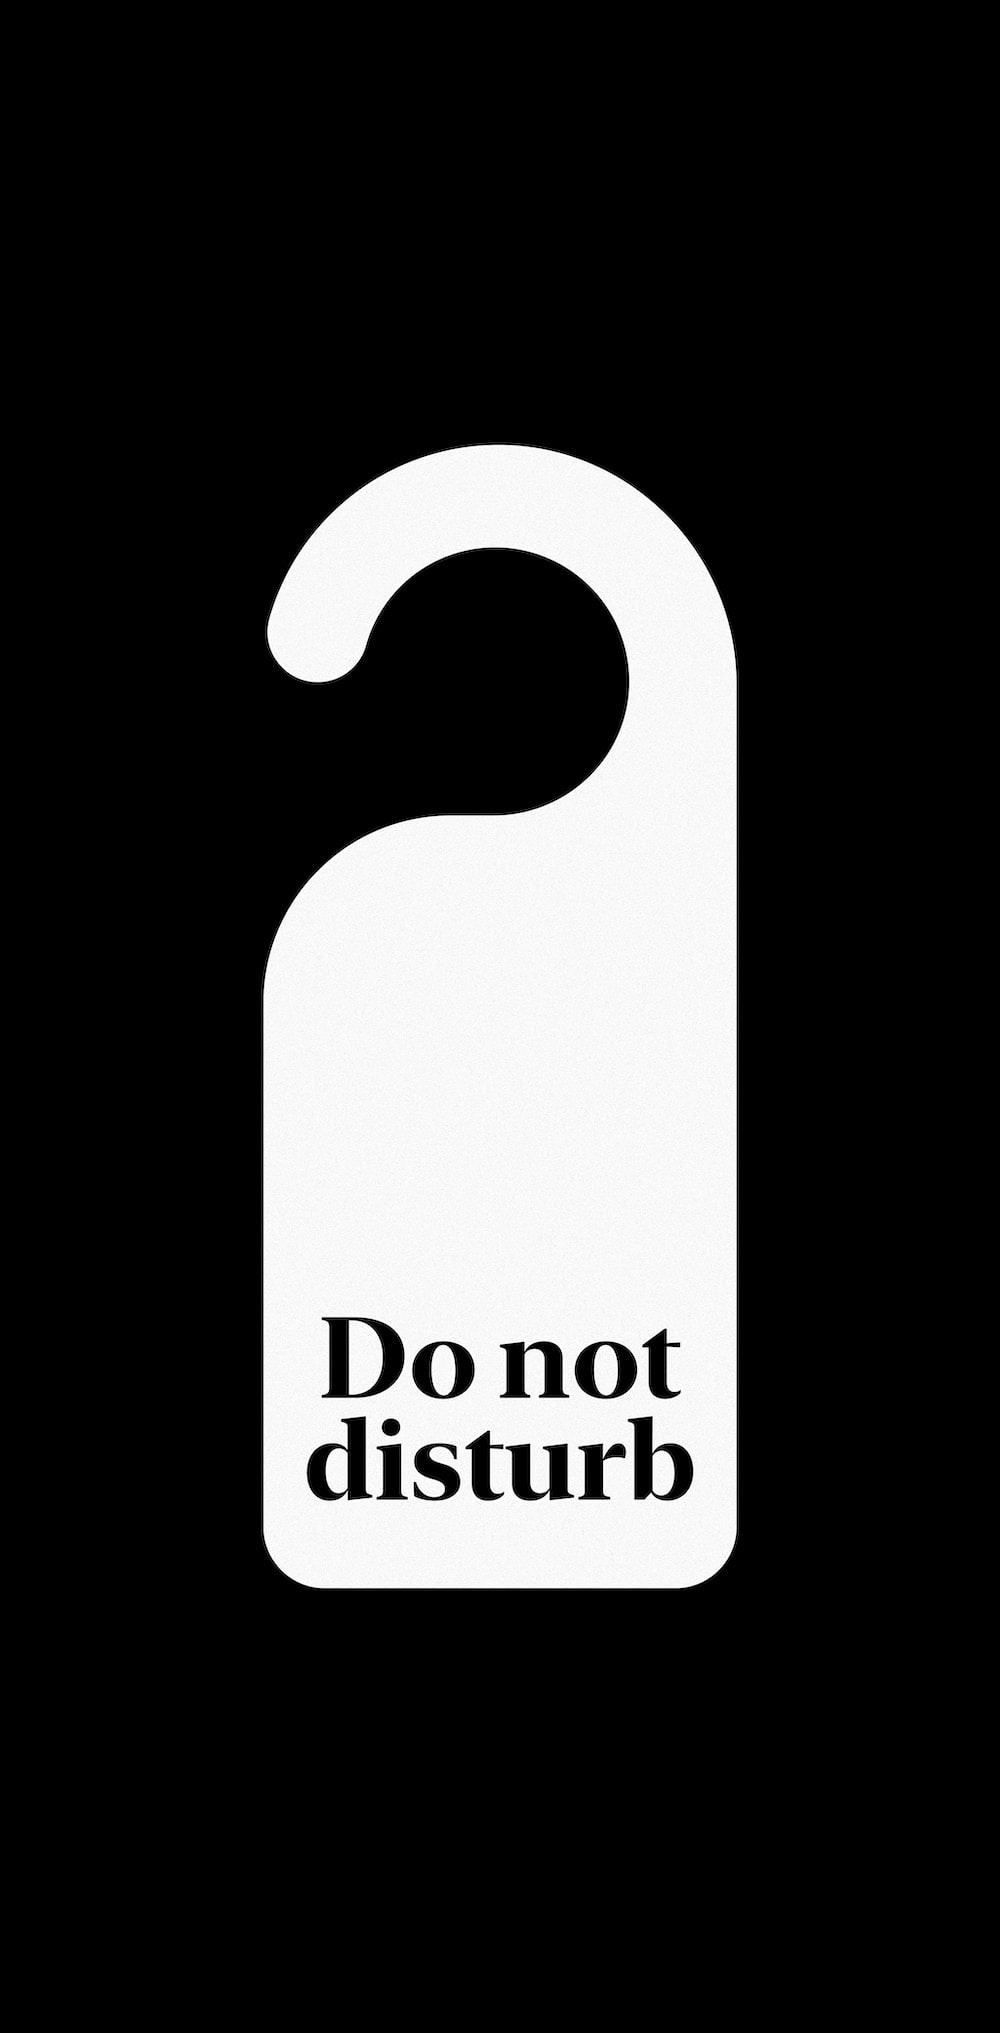 Please do not disturb my quarantine.